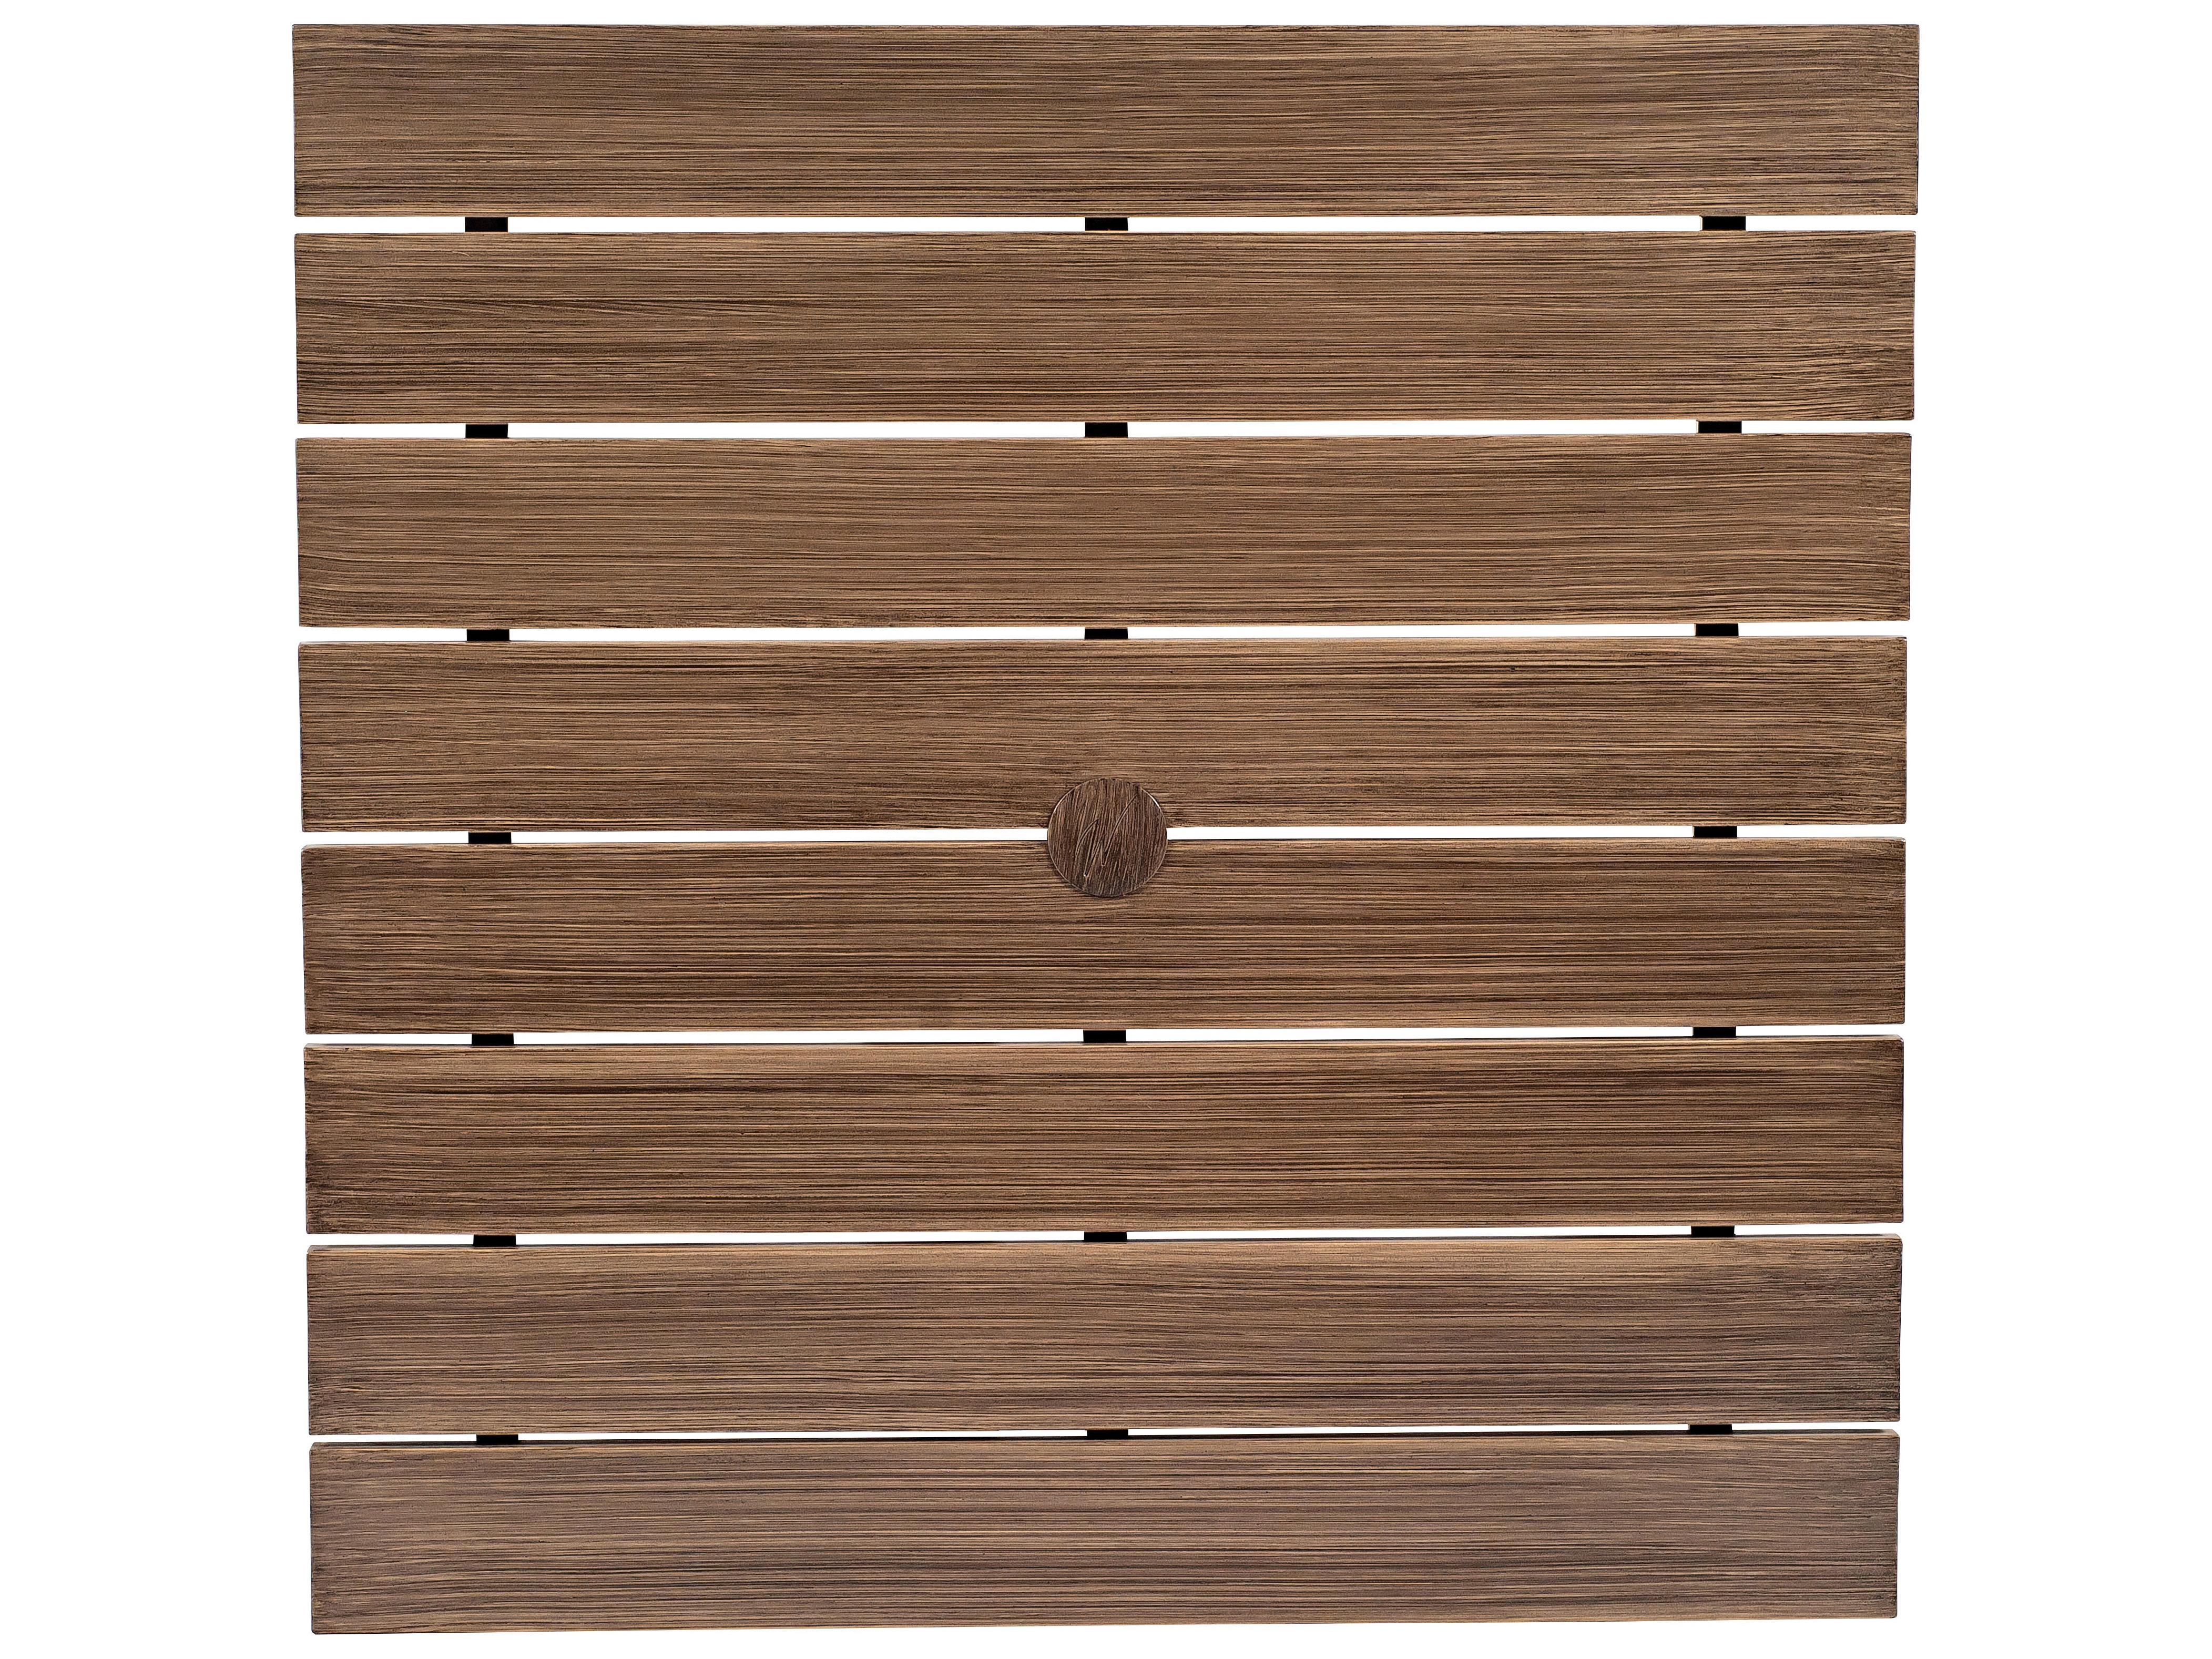 Woodard extruded aluminum woodland 48 x 36 rectangular for Coffee table 48 x 36